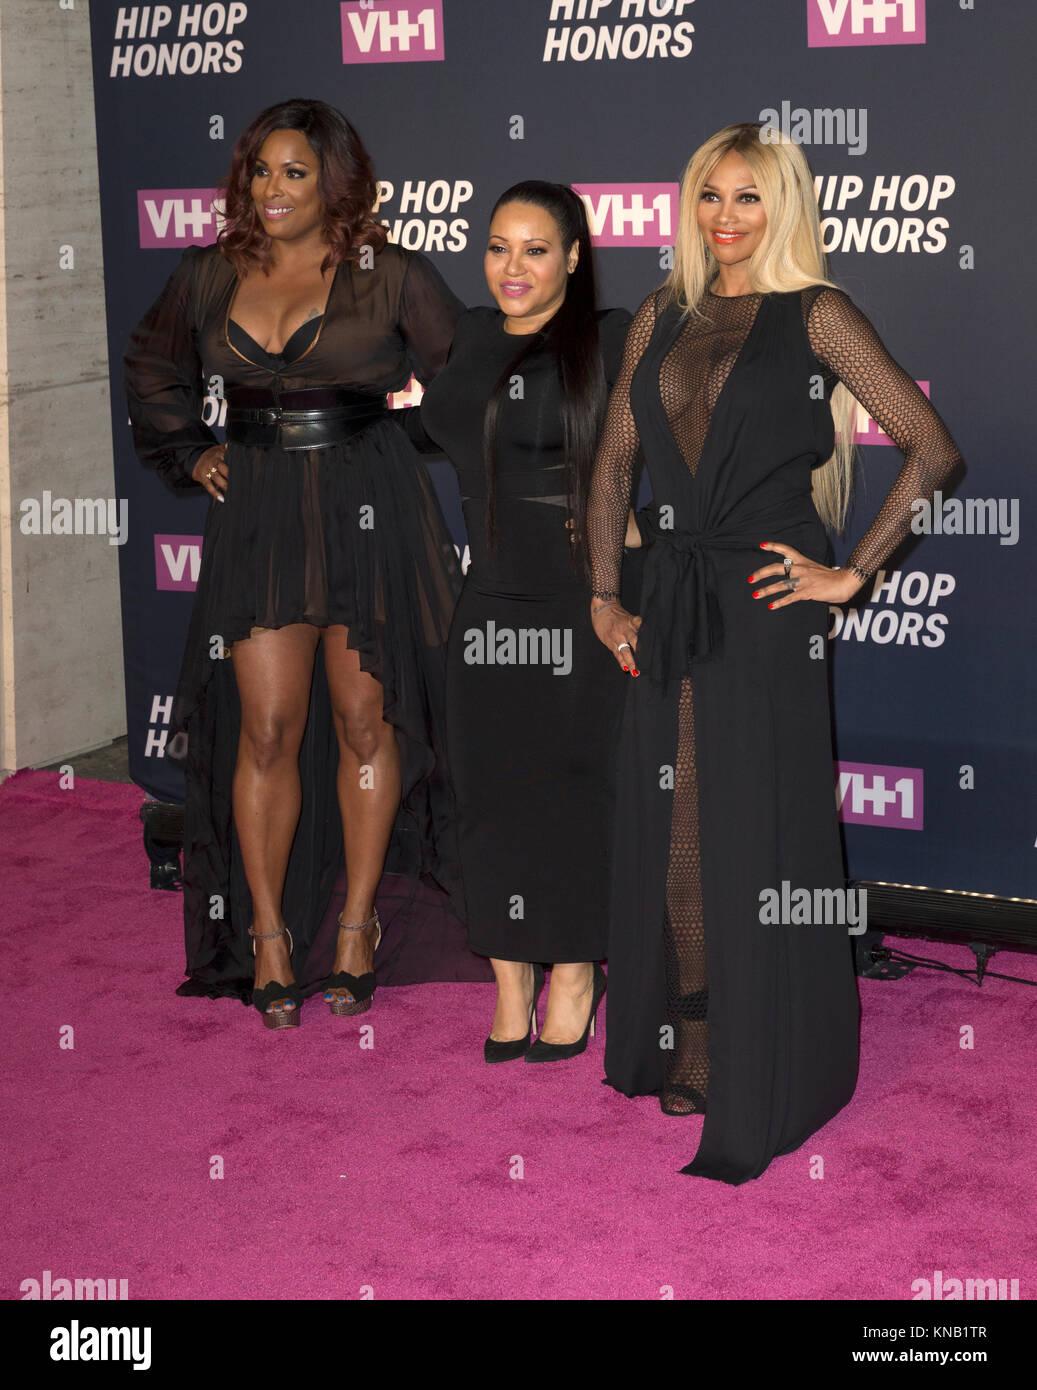 New York, NY - 11. Juli 2016: Salt-N-Pepa: DJ Spinderella, Cheryl James, Sandra Pepa Denton besuchen 2016 VH1 Hip Stockbild